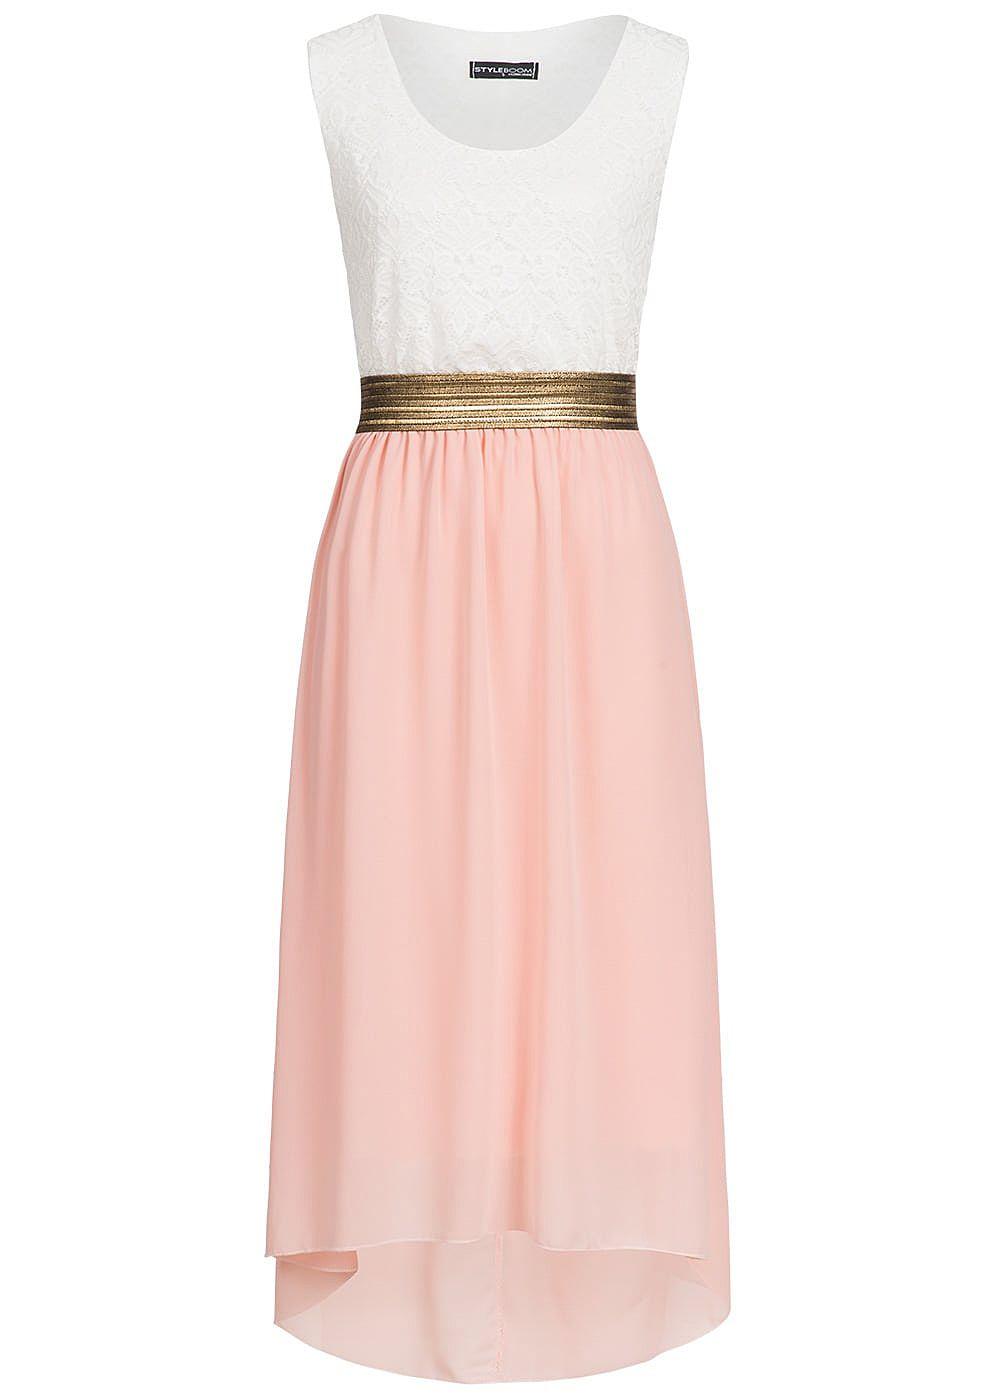 styleboom fashion damen chiffon kleid spitze weiss rosa